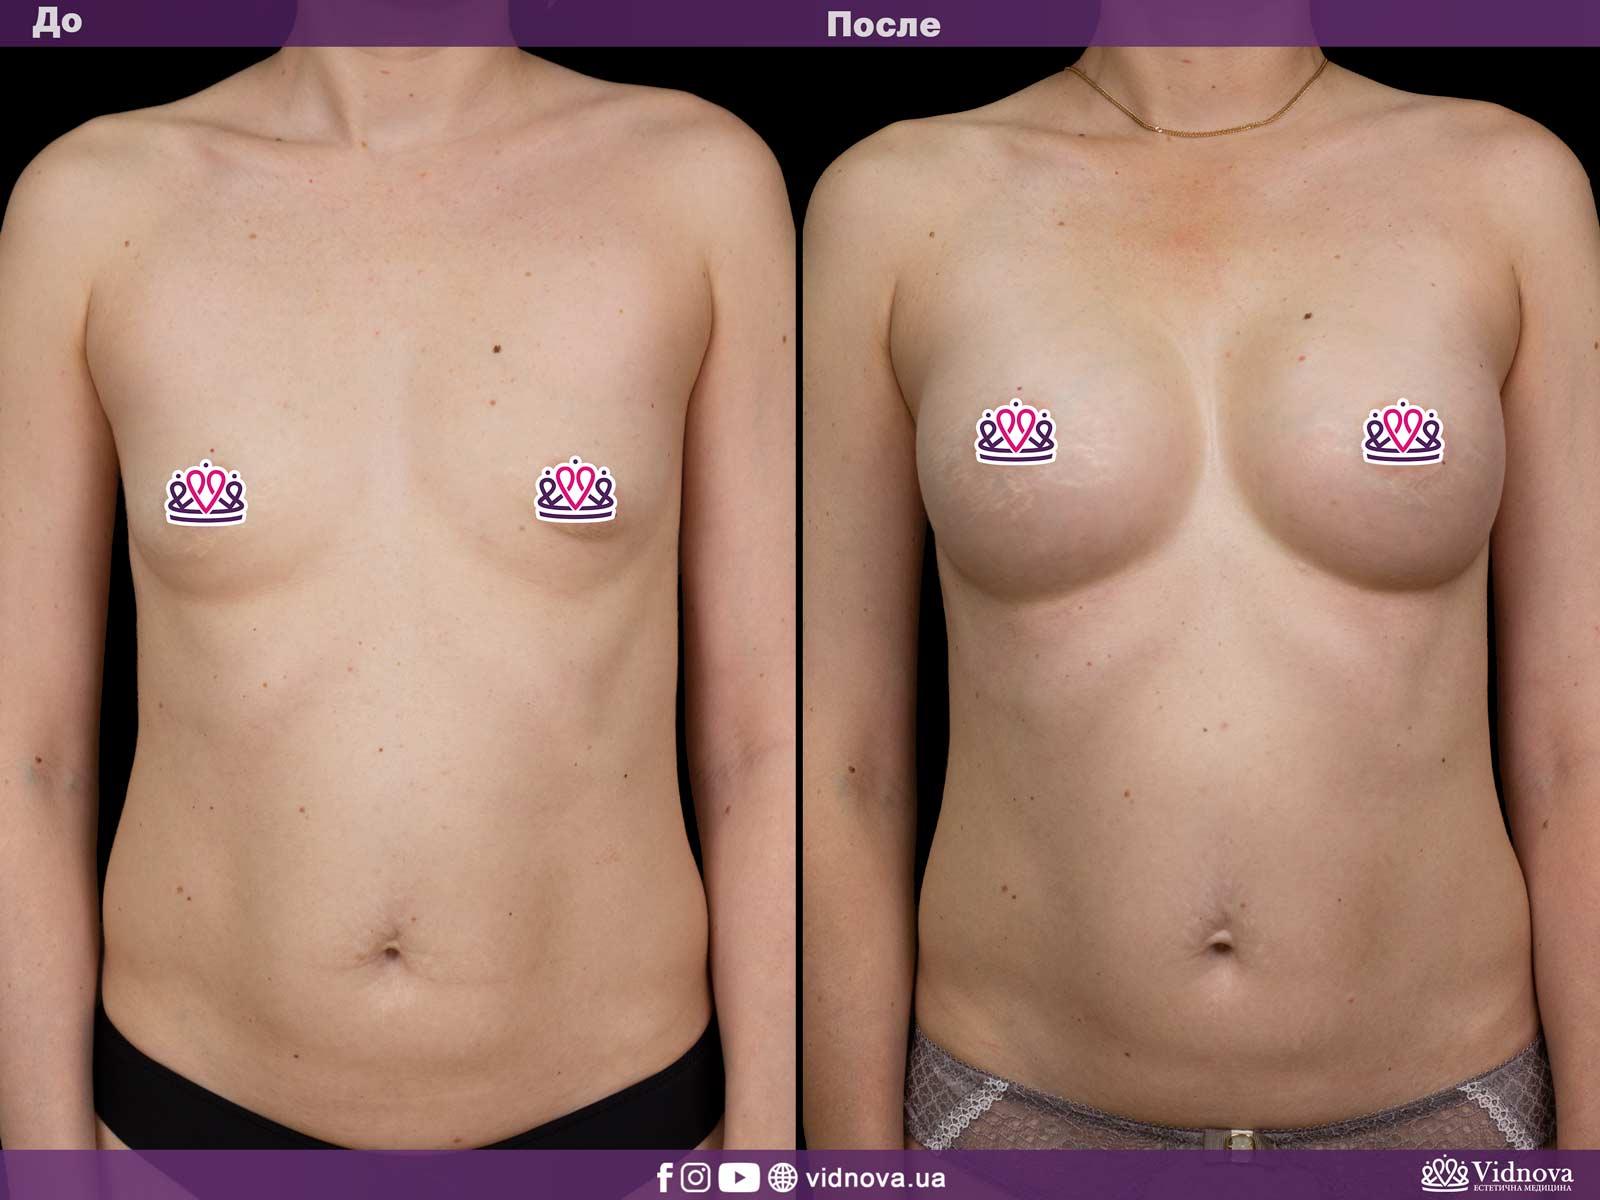 Увеличение груди: Фото ДО и ПОСЛЕ - Пример №24-1 - Клиника Vidnova